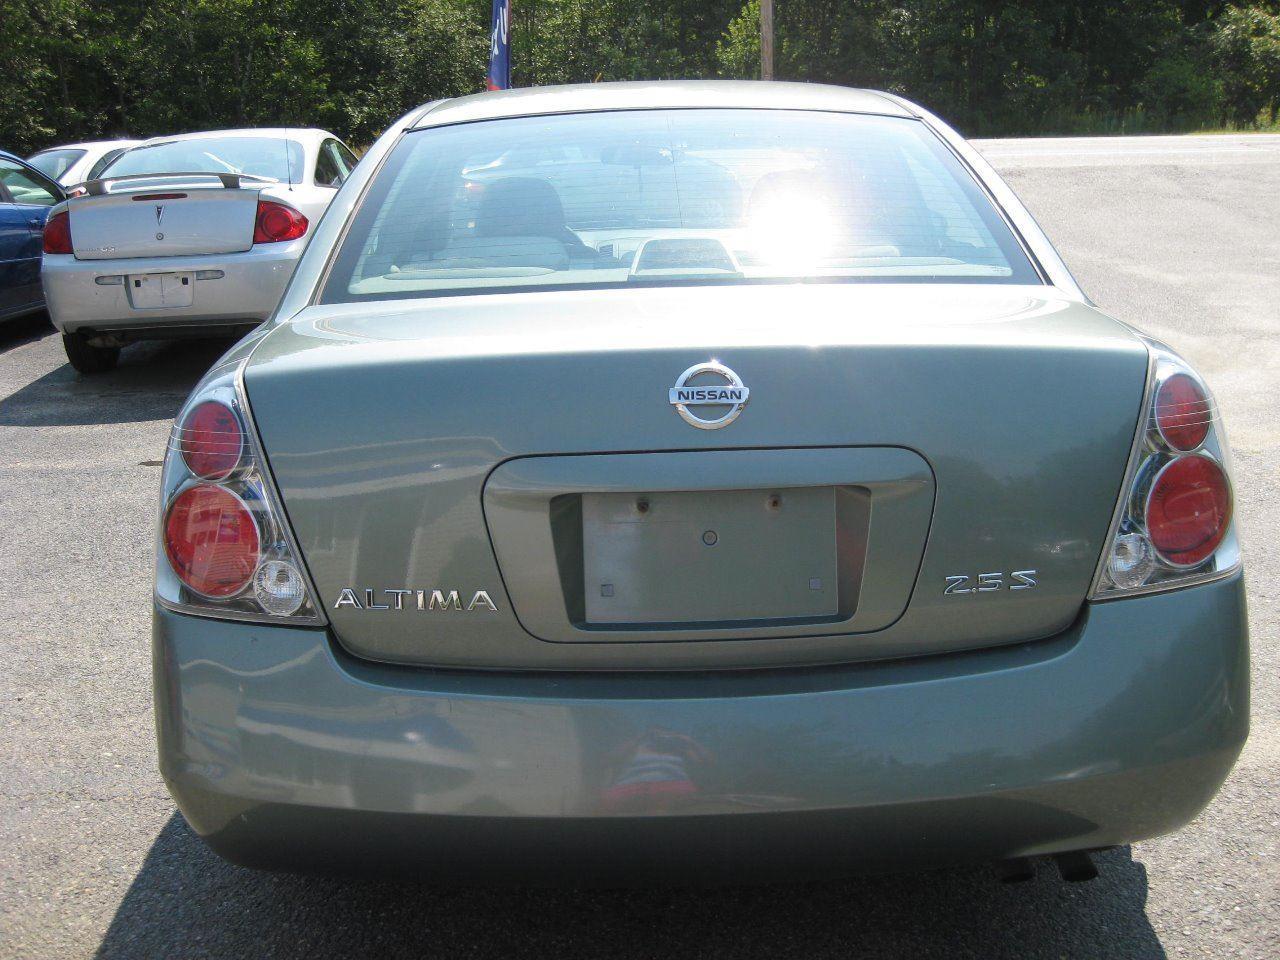 2005 nissan altima 2.5 s 4dr sedan in leeds me - morgan's auto s